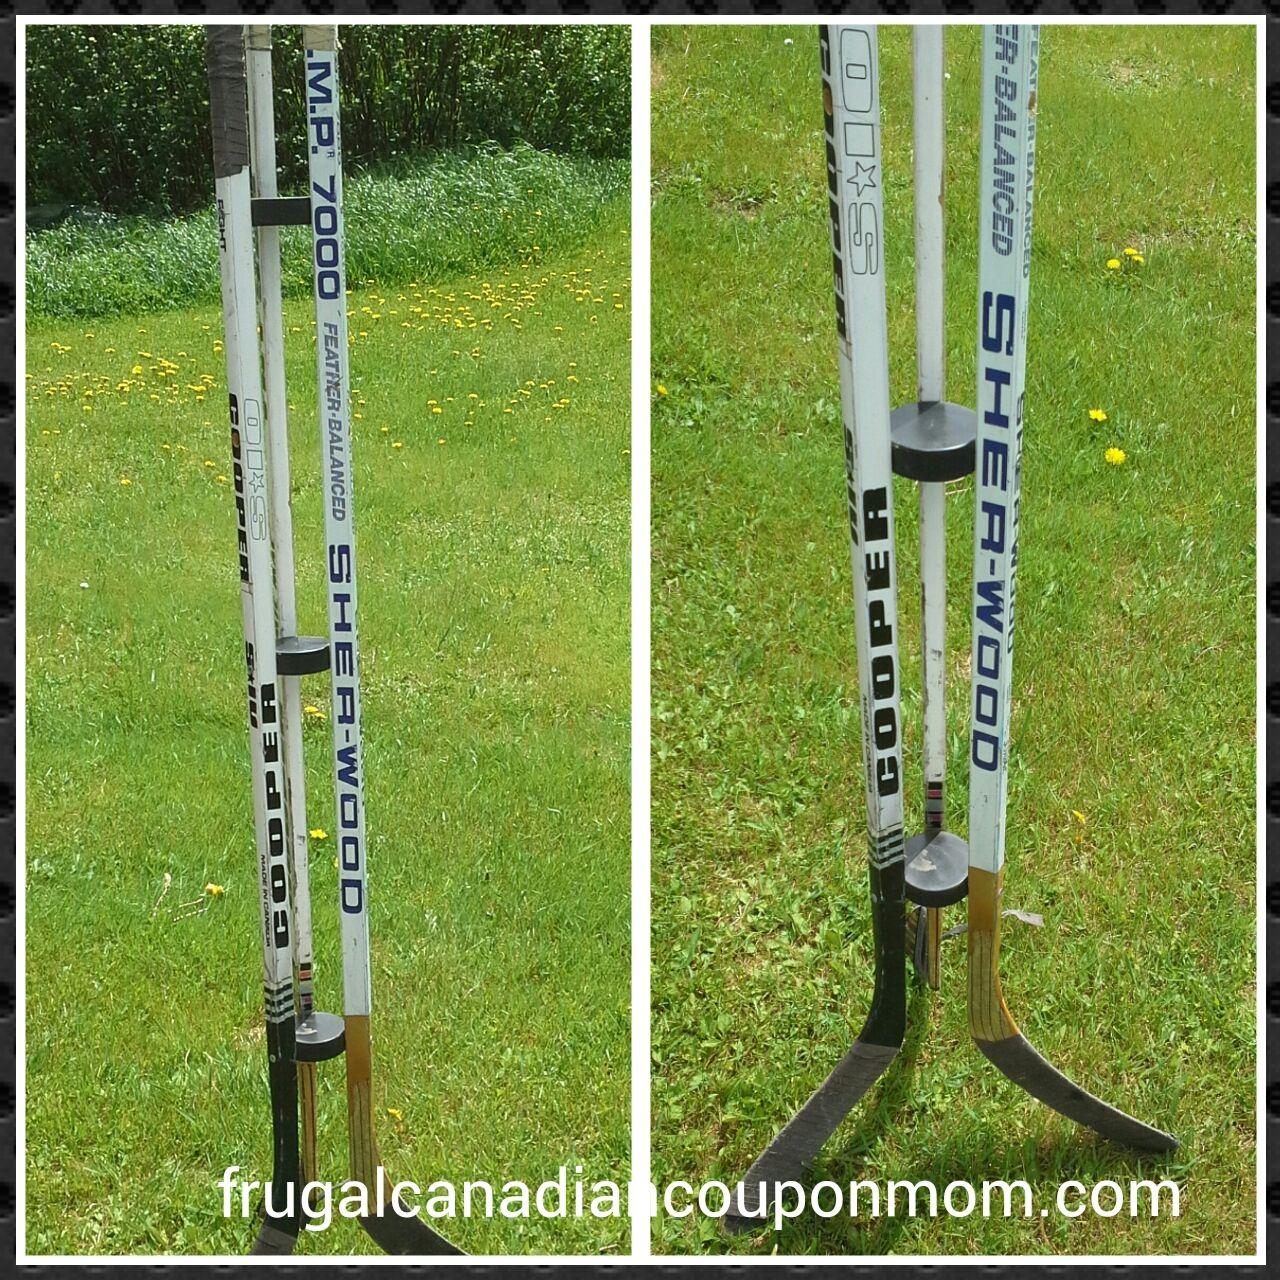 Hockey Stick Coat Racks: Do It Yourself Recycled Hockey Stick Coat Rack My Brother